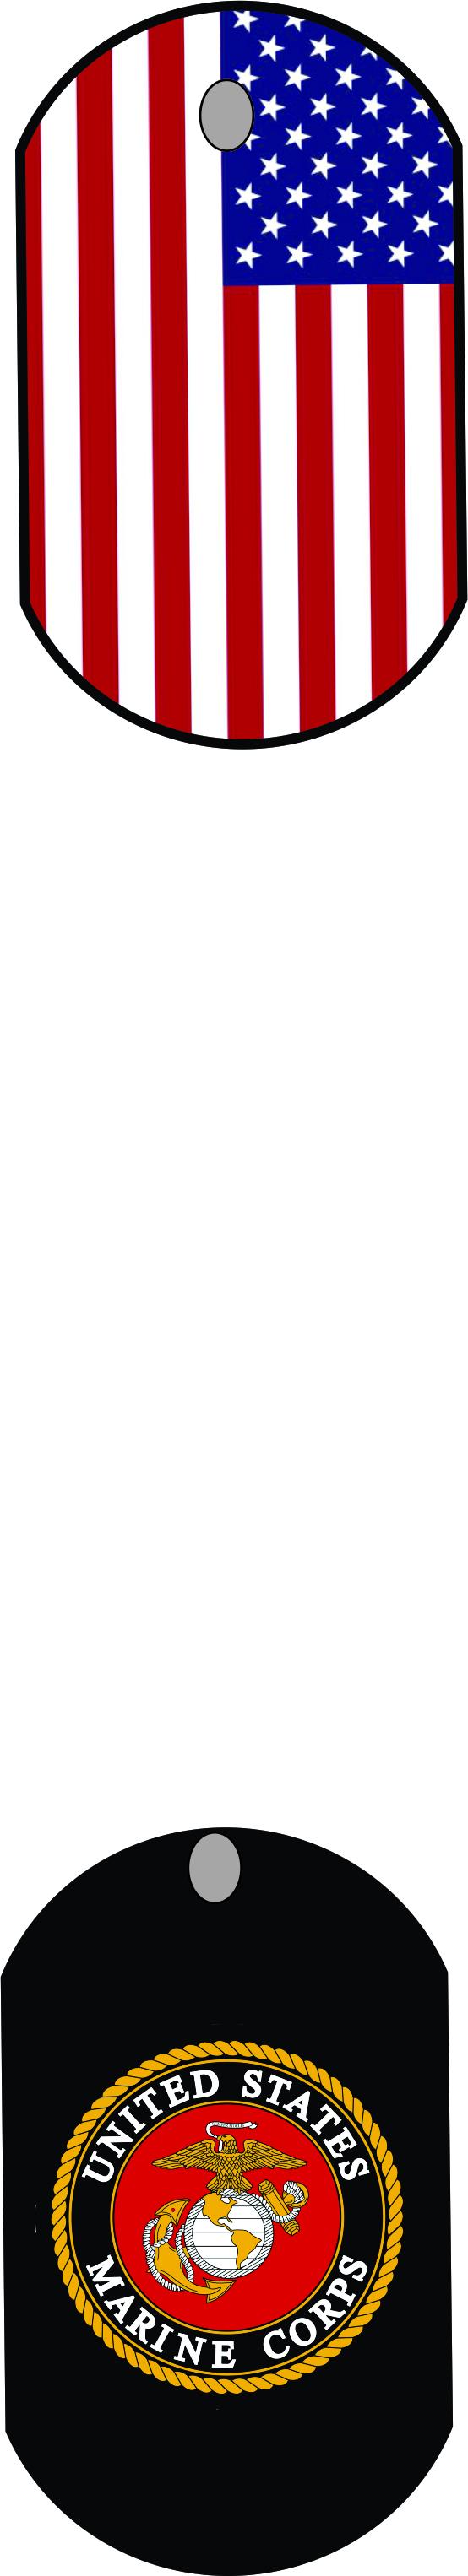 dog tag -American flag marine logo (2017_04_28 13_23_57 UTC).jpg